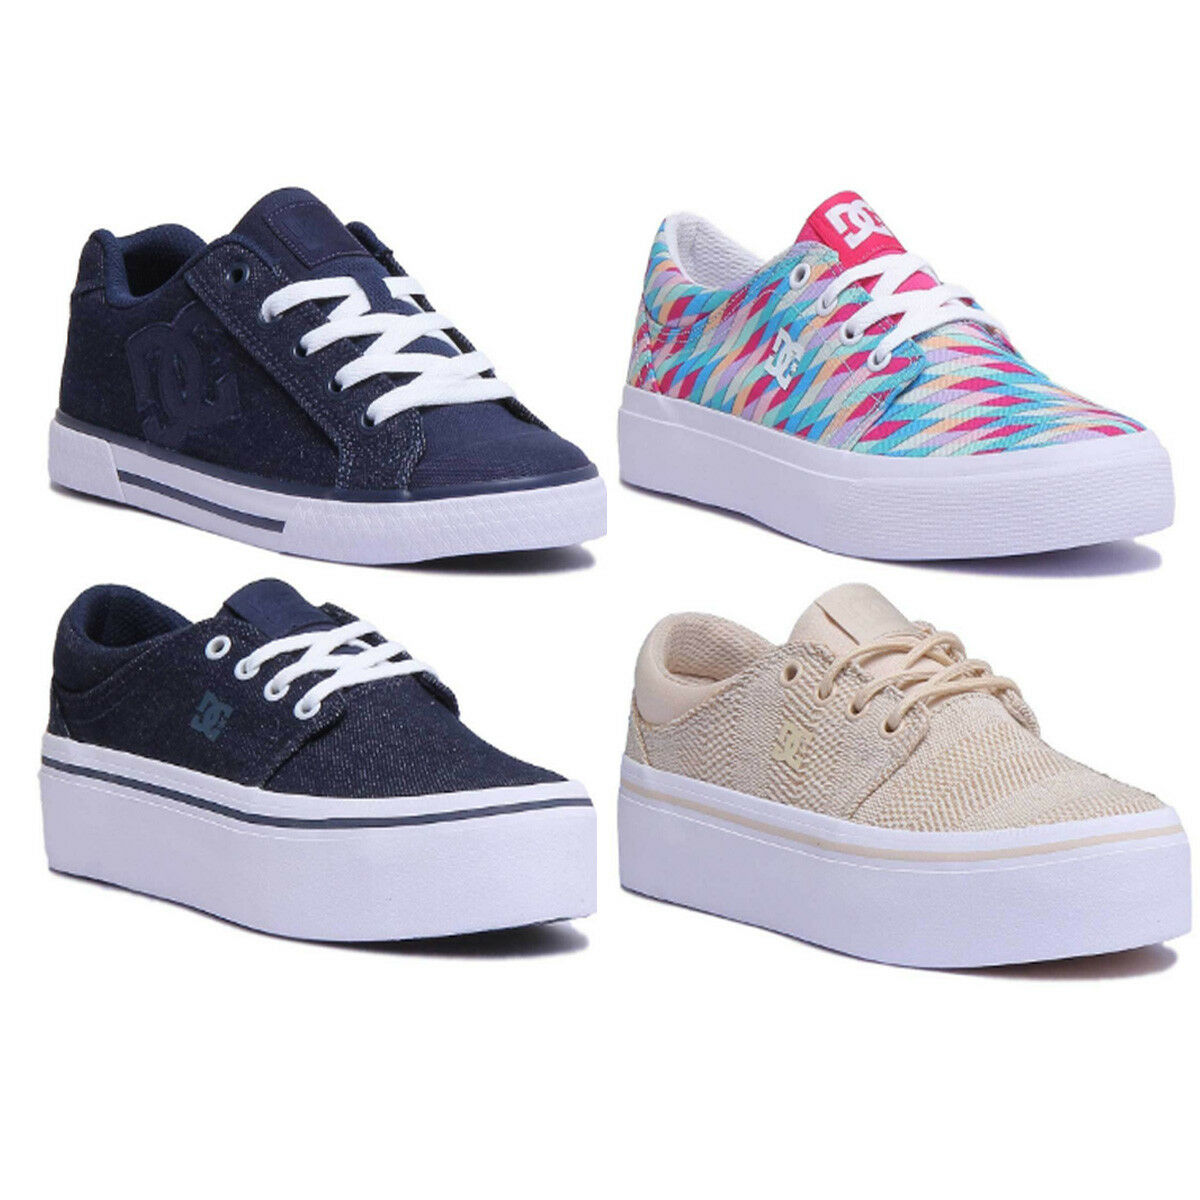 Dc Denim Shoes Trase Platform Womens Denim Dc Canvas Trainer Size UK 3 - 8 3f9e40